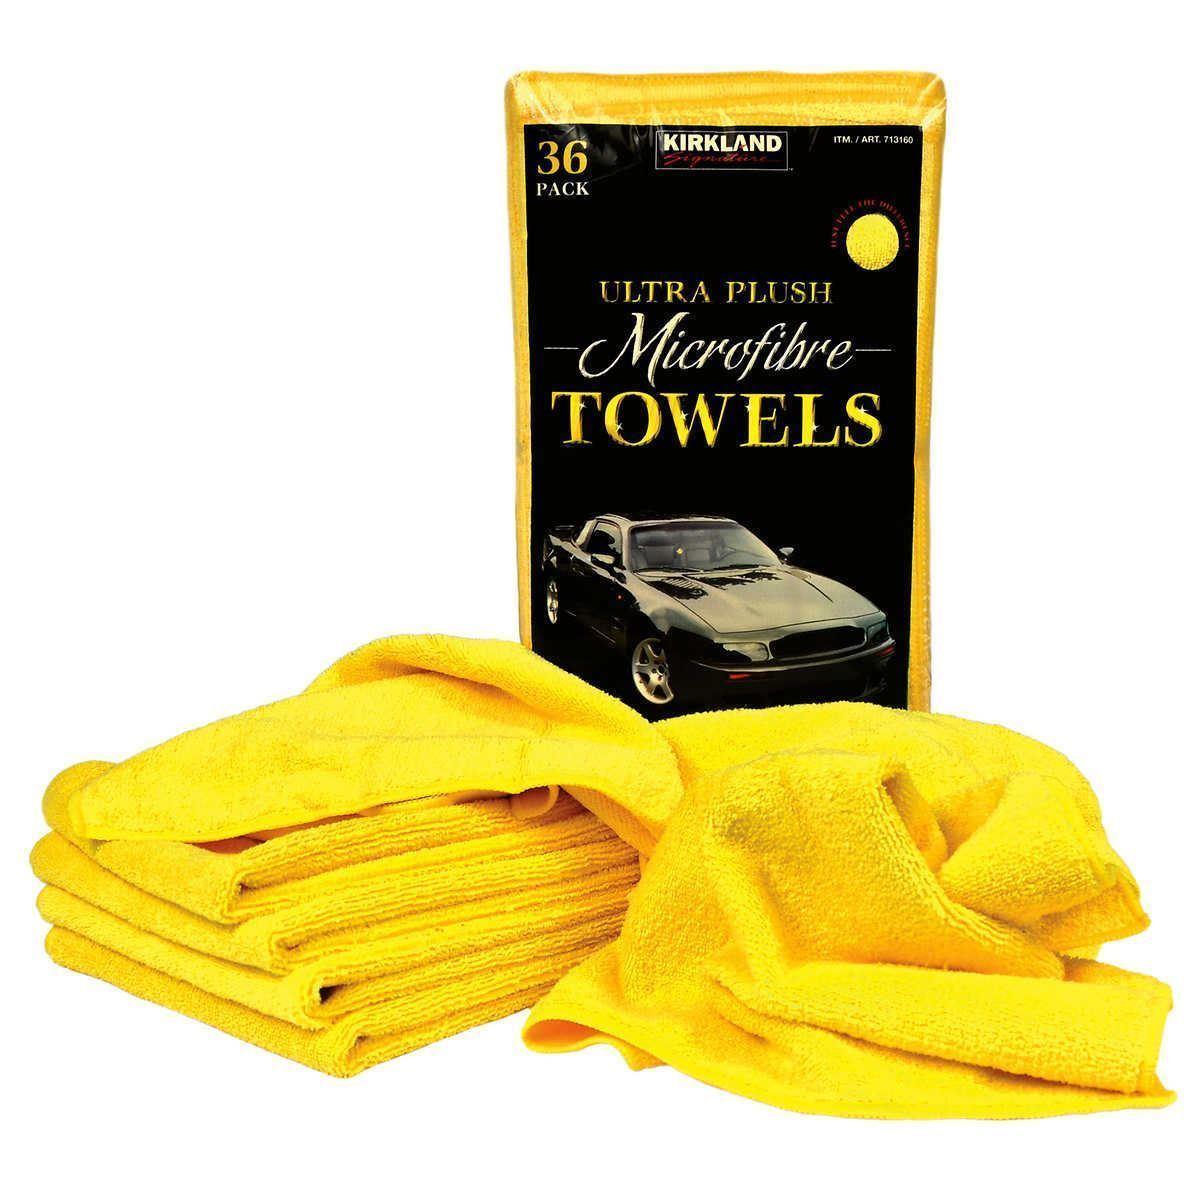 Kirkland Signature Ultra Plus Microfibre Towels (~41cm x 41cm) - 36 Pack for £13.18 @ Costco (from 08/07)